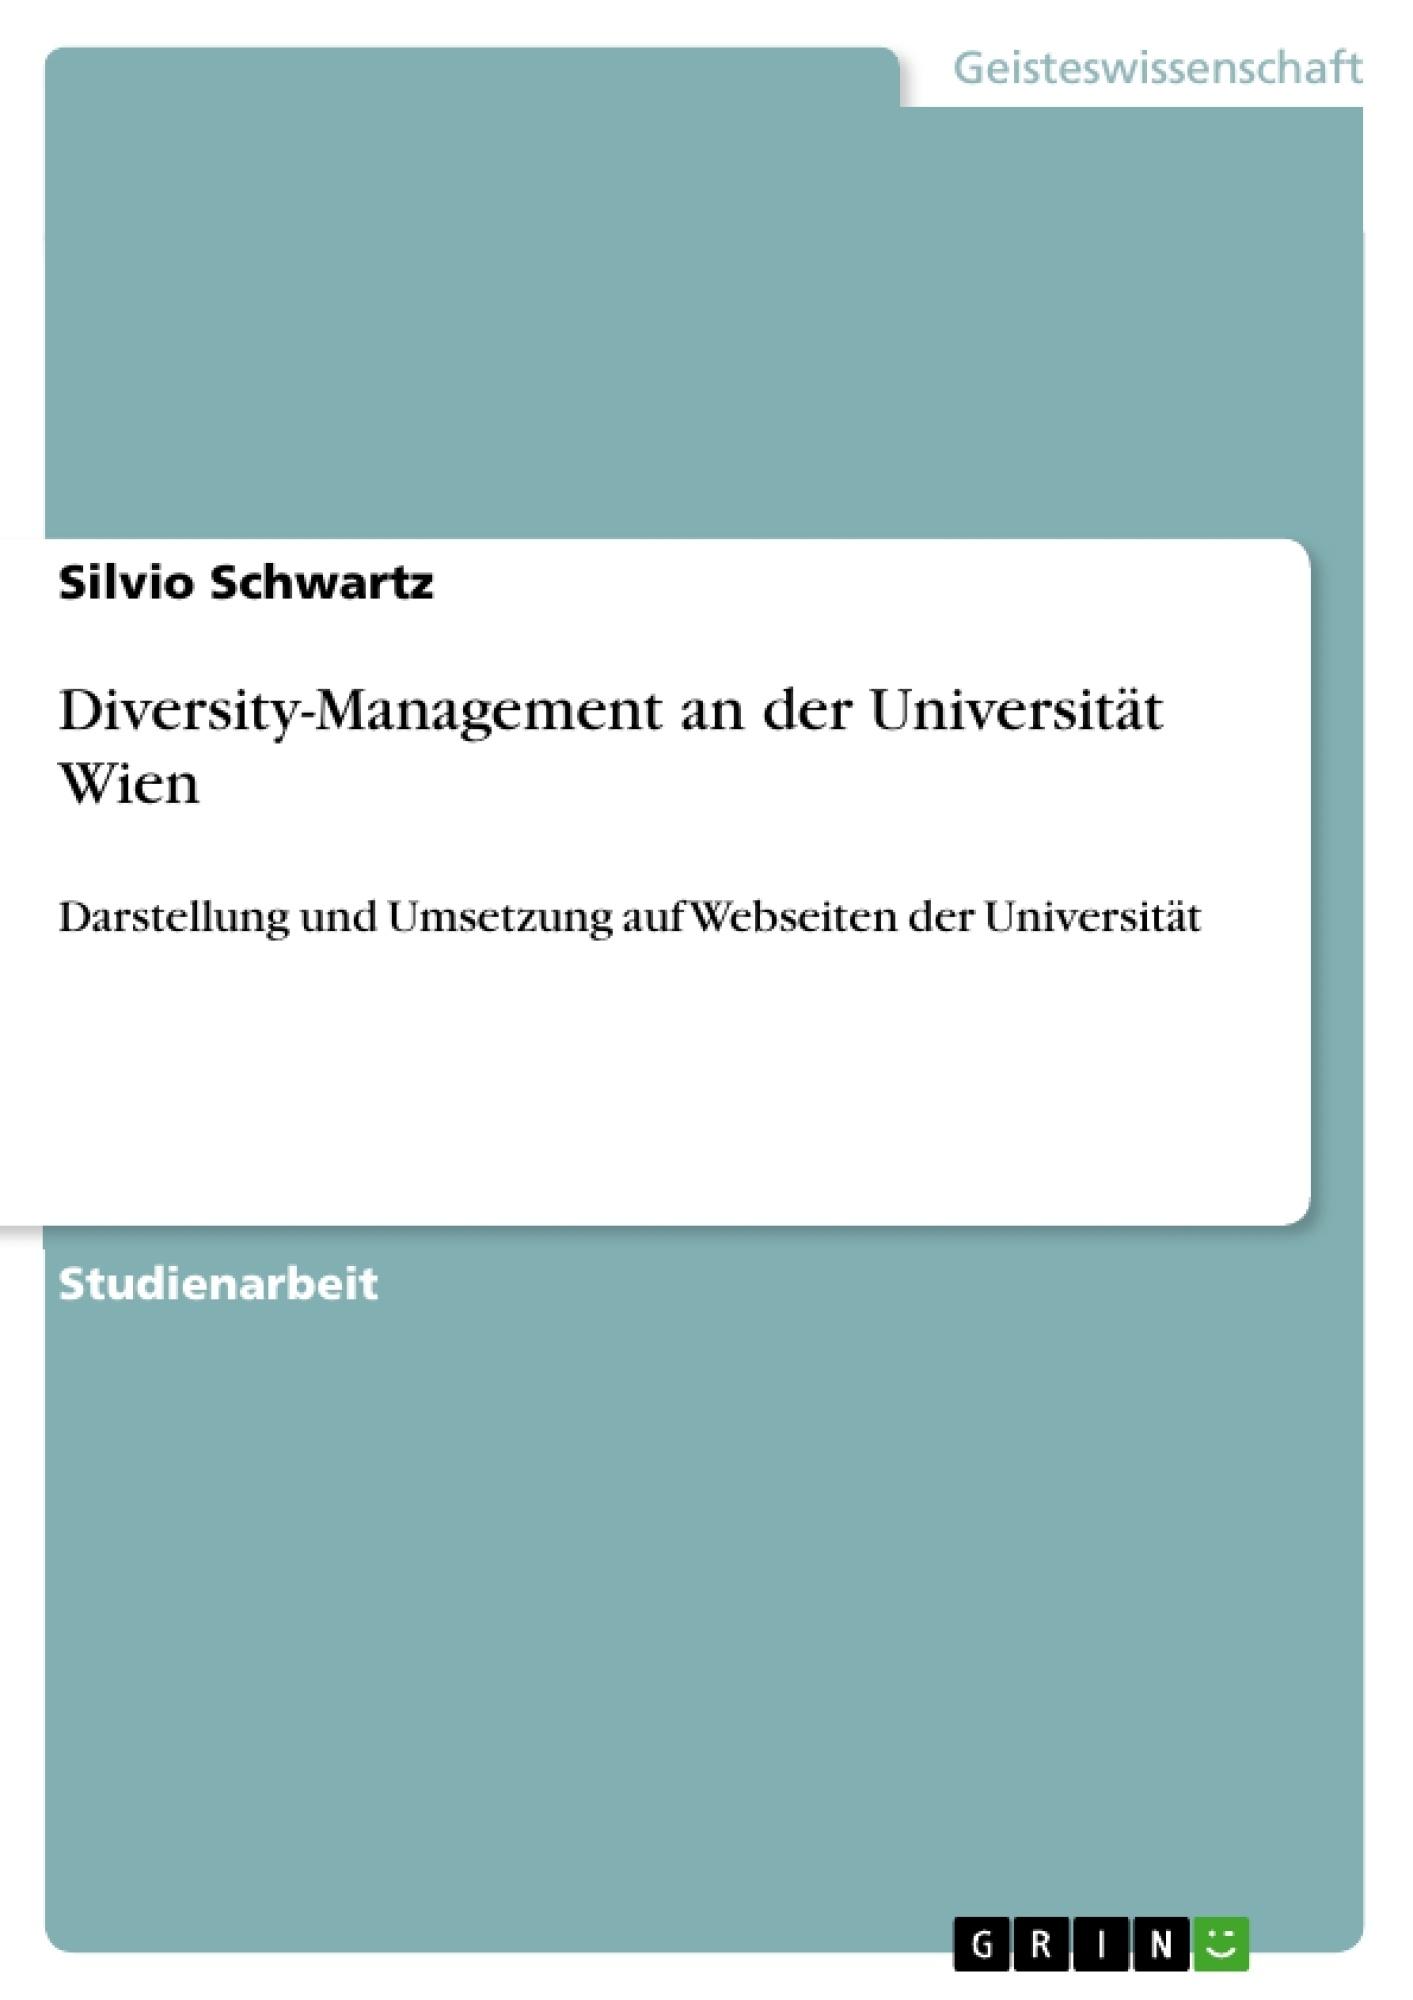 Titel: Diversity-Management an der Universität Wien